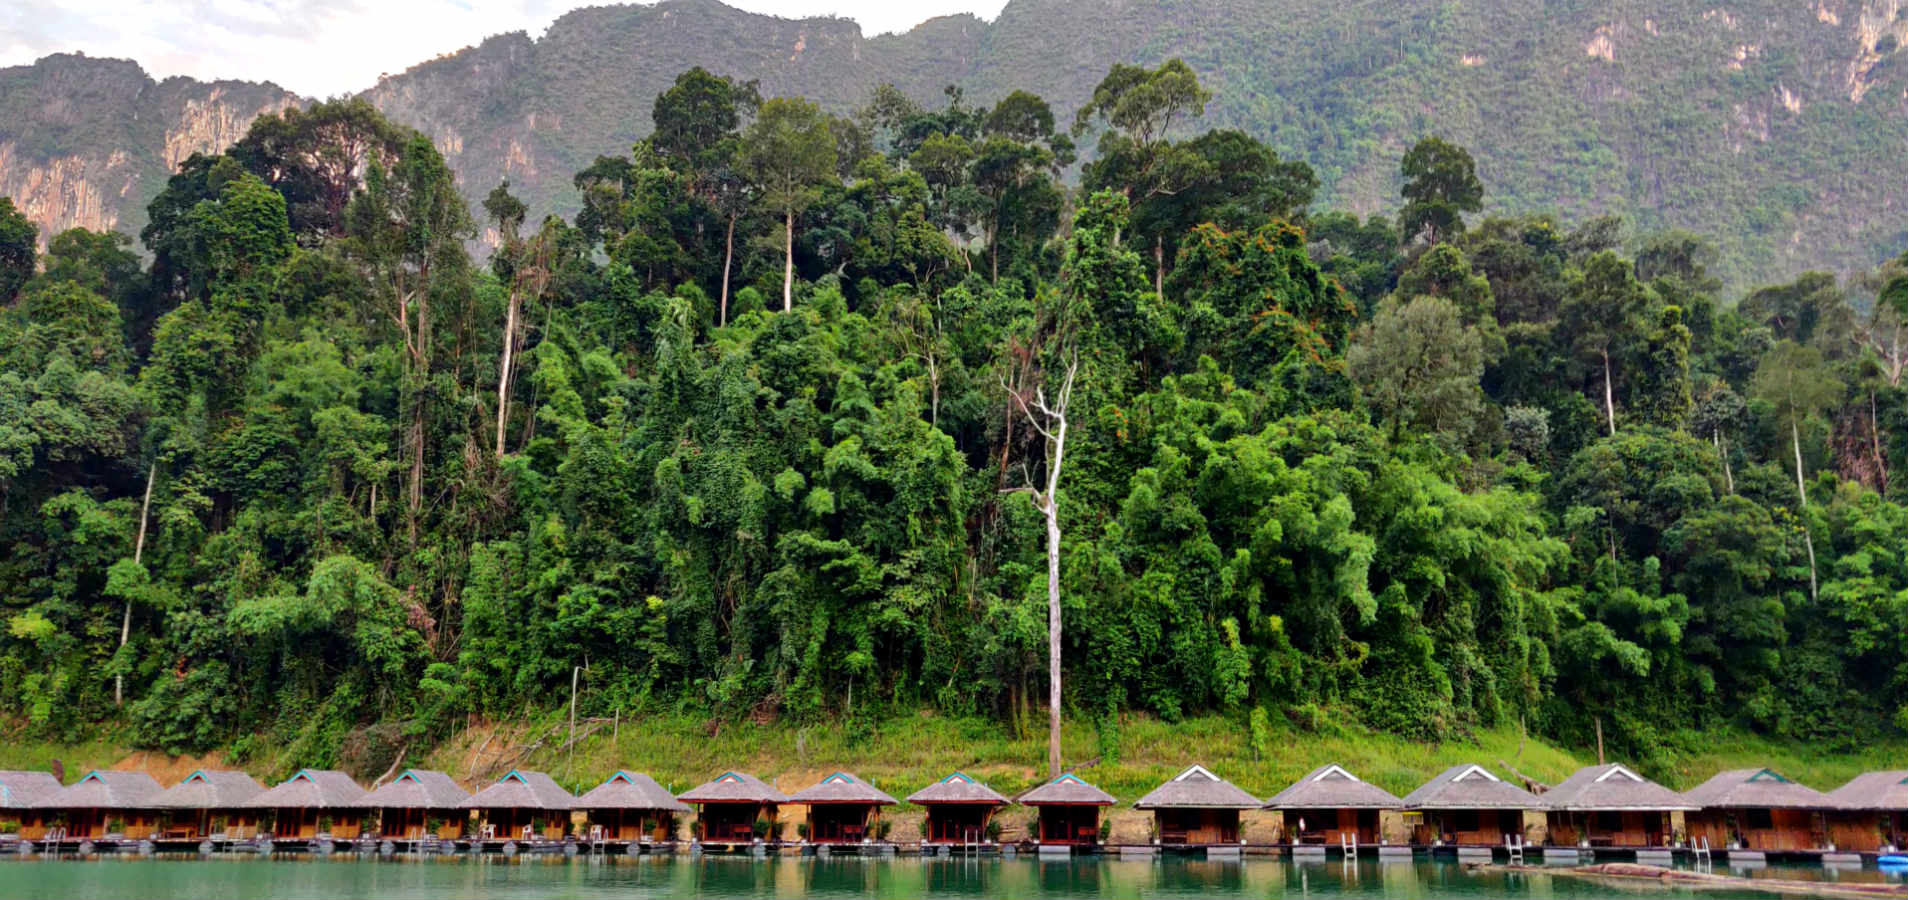 Cheow Lan Lake Khao Sok National Park, drijvende huisjes